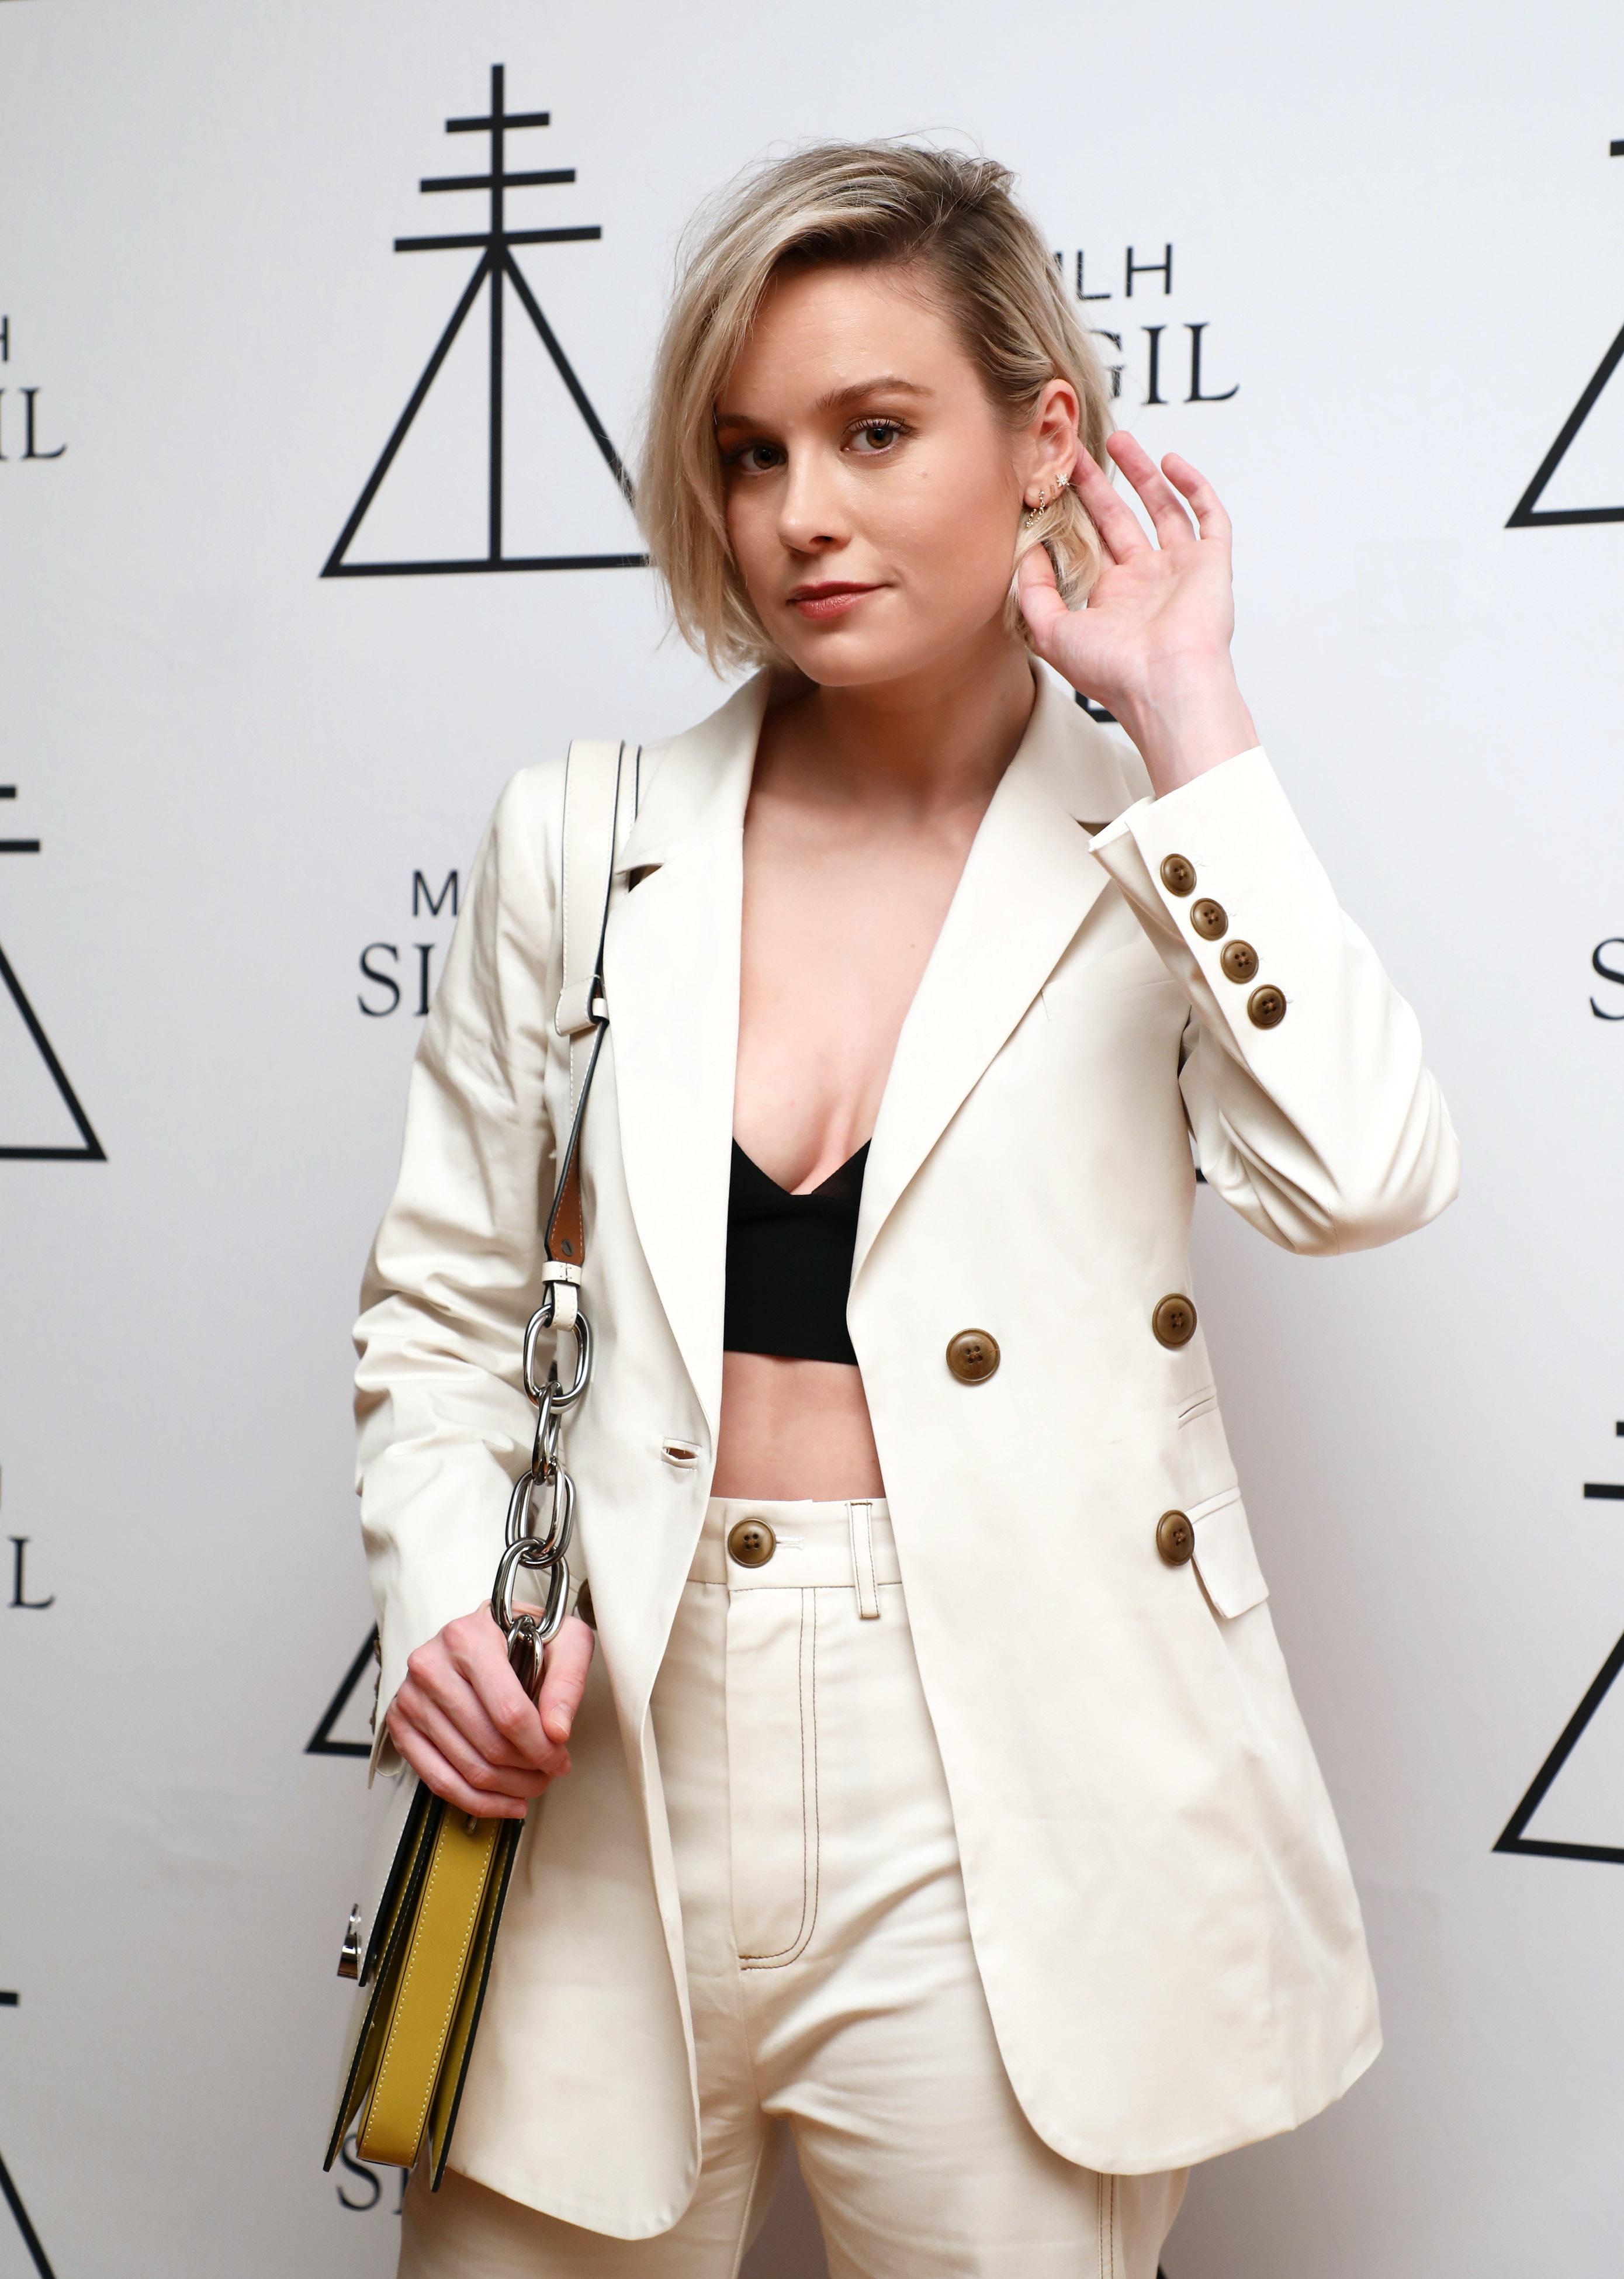 Brie Larson S New Bob Haircut Is A Major Change That Looks So Good Photos